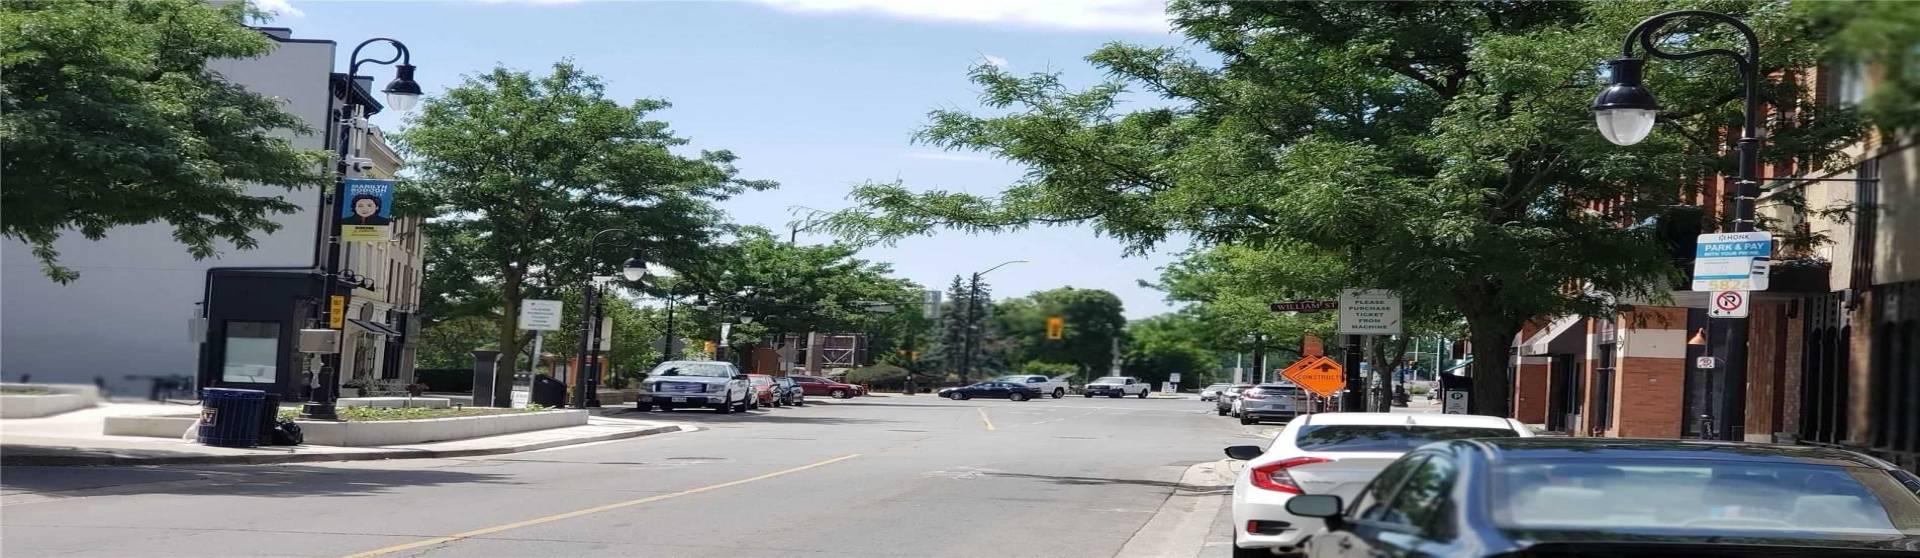 66 St. Paul St- St. Catharines- Ontario L2R3M2, 9 Bedrooms Bedrooms, 9 Rooms Rooms,6 BathroomsBathrooms,Multiplex,Sale,St. Paul,X4810777